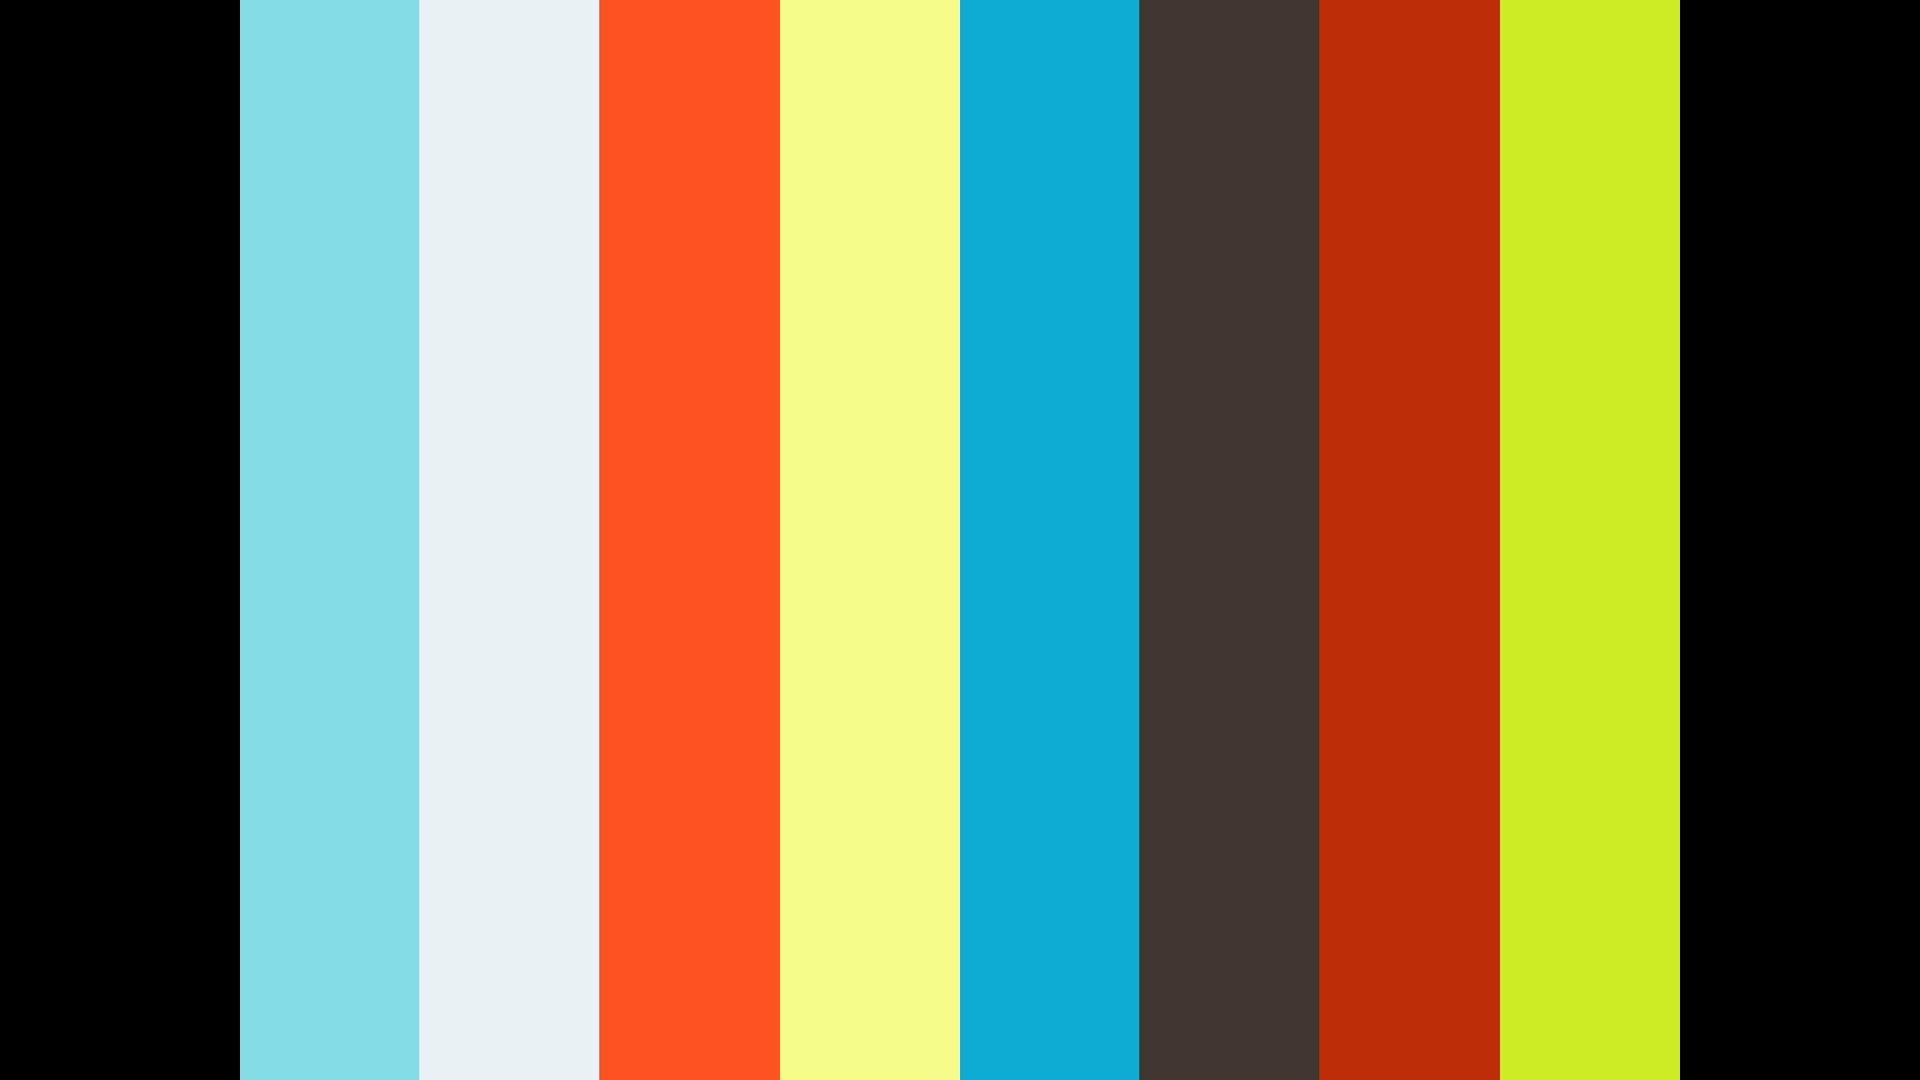 David Campana x IMAWAKE - Modern Malaise - Official Movie